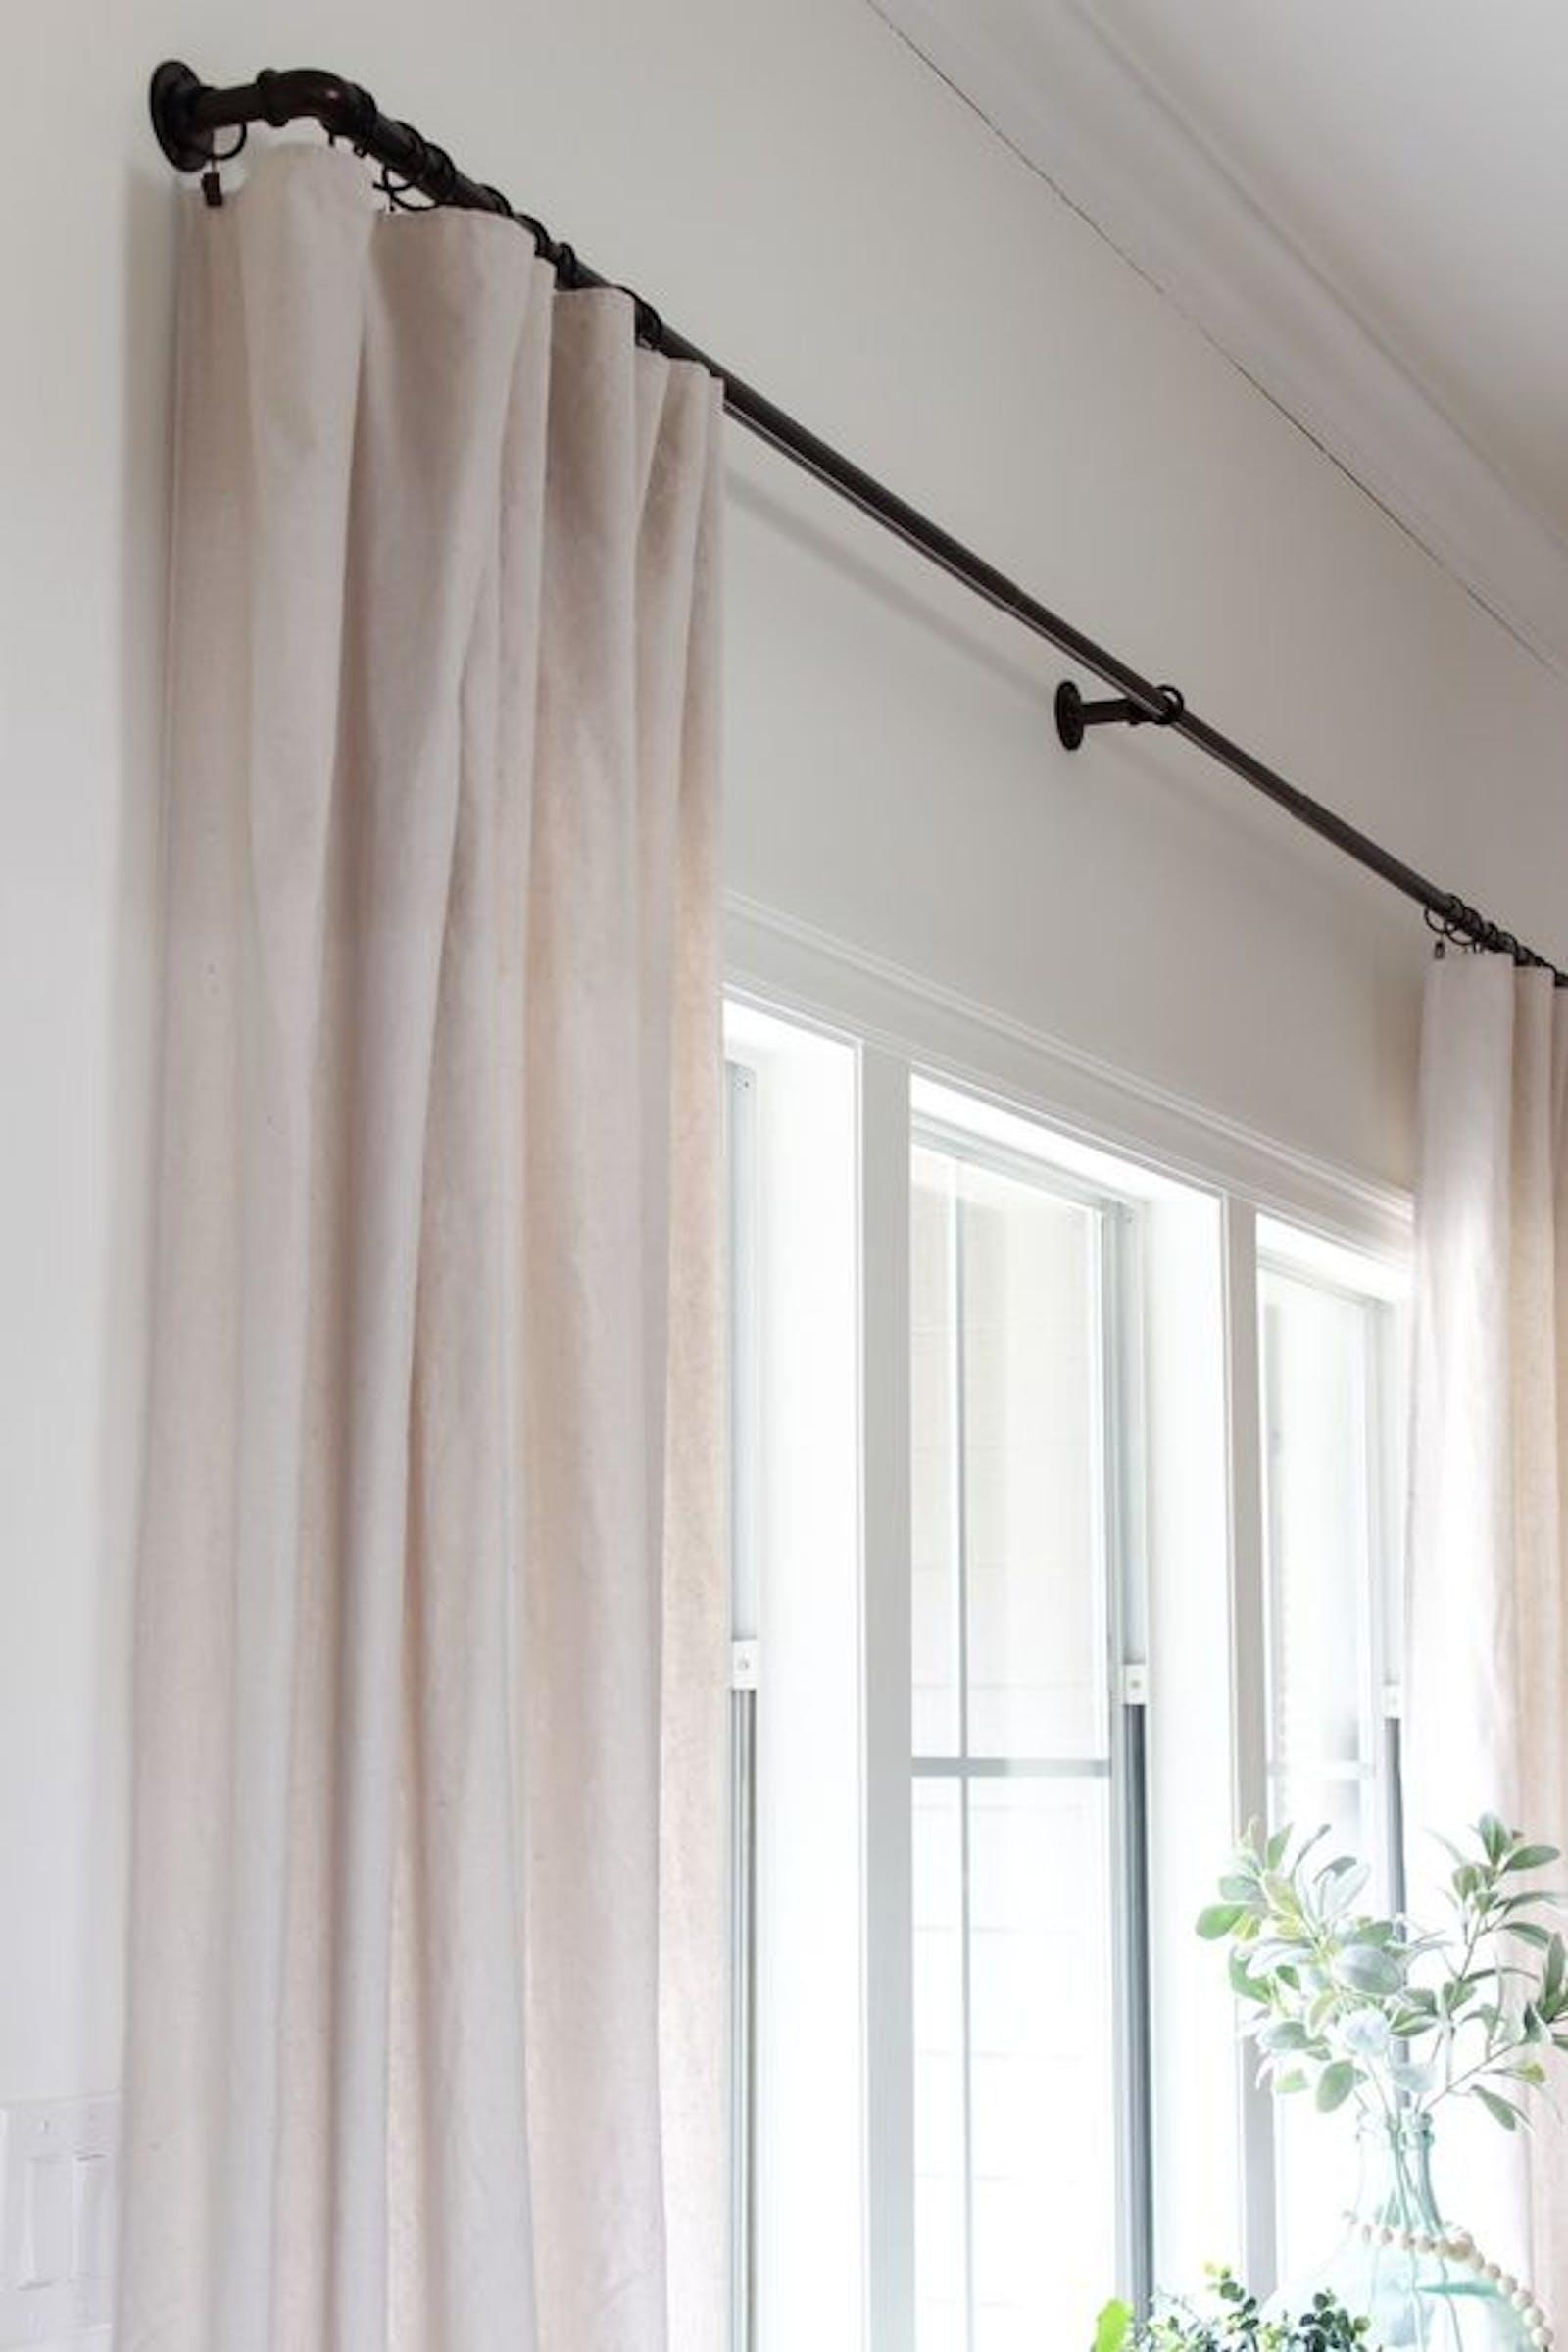 Black curtain rail with white linen curtains